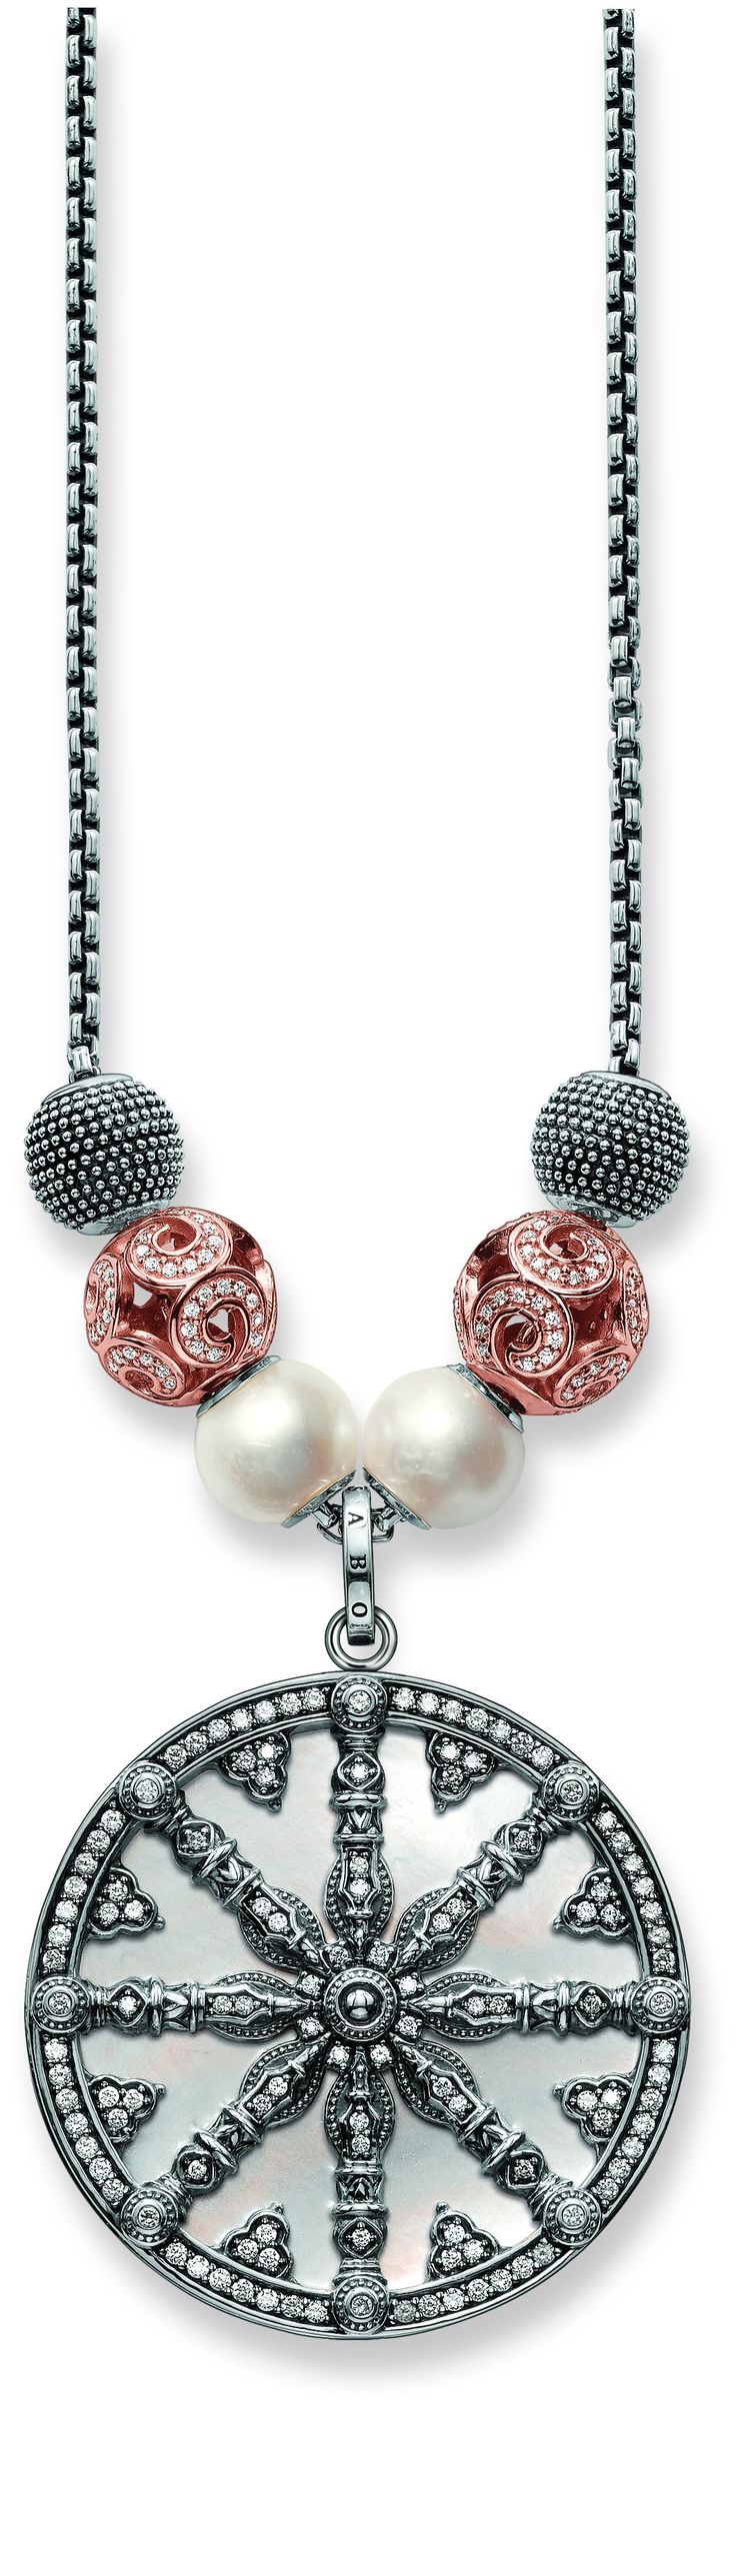 THOMAS SABO SS2014 - Karma Beads with the Wheel of Karma